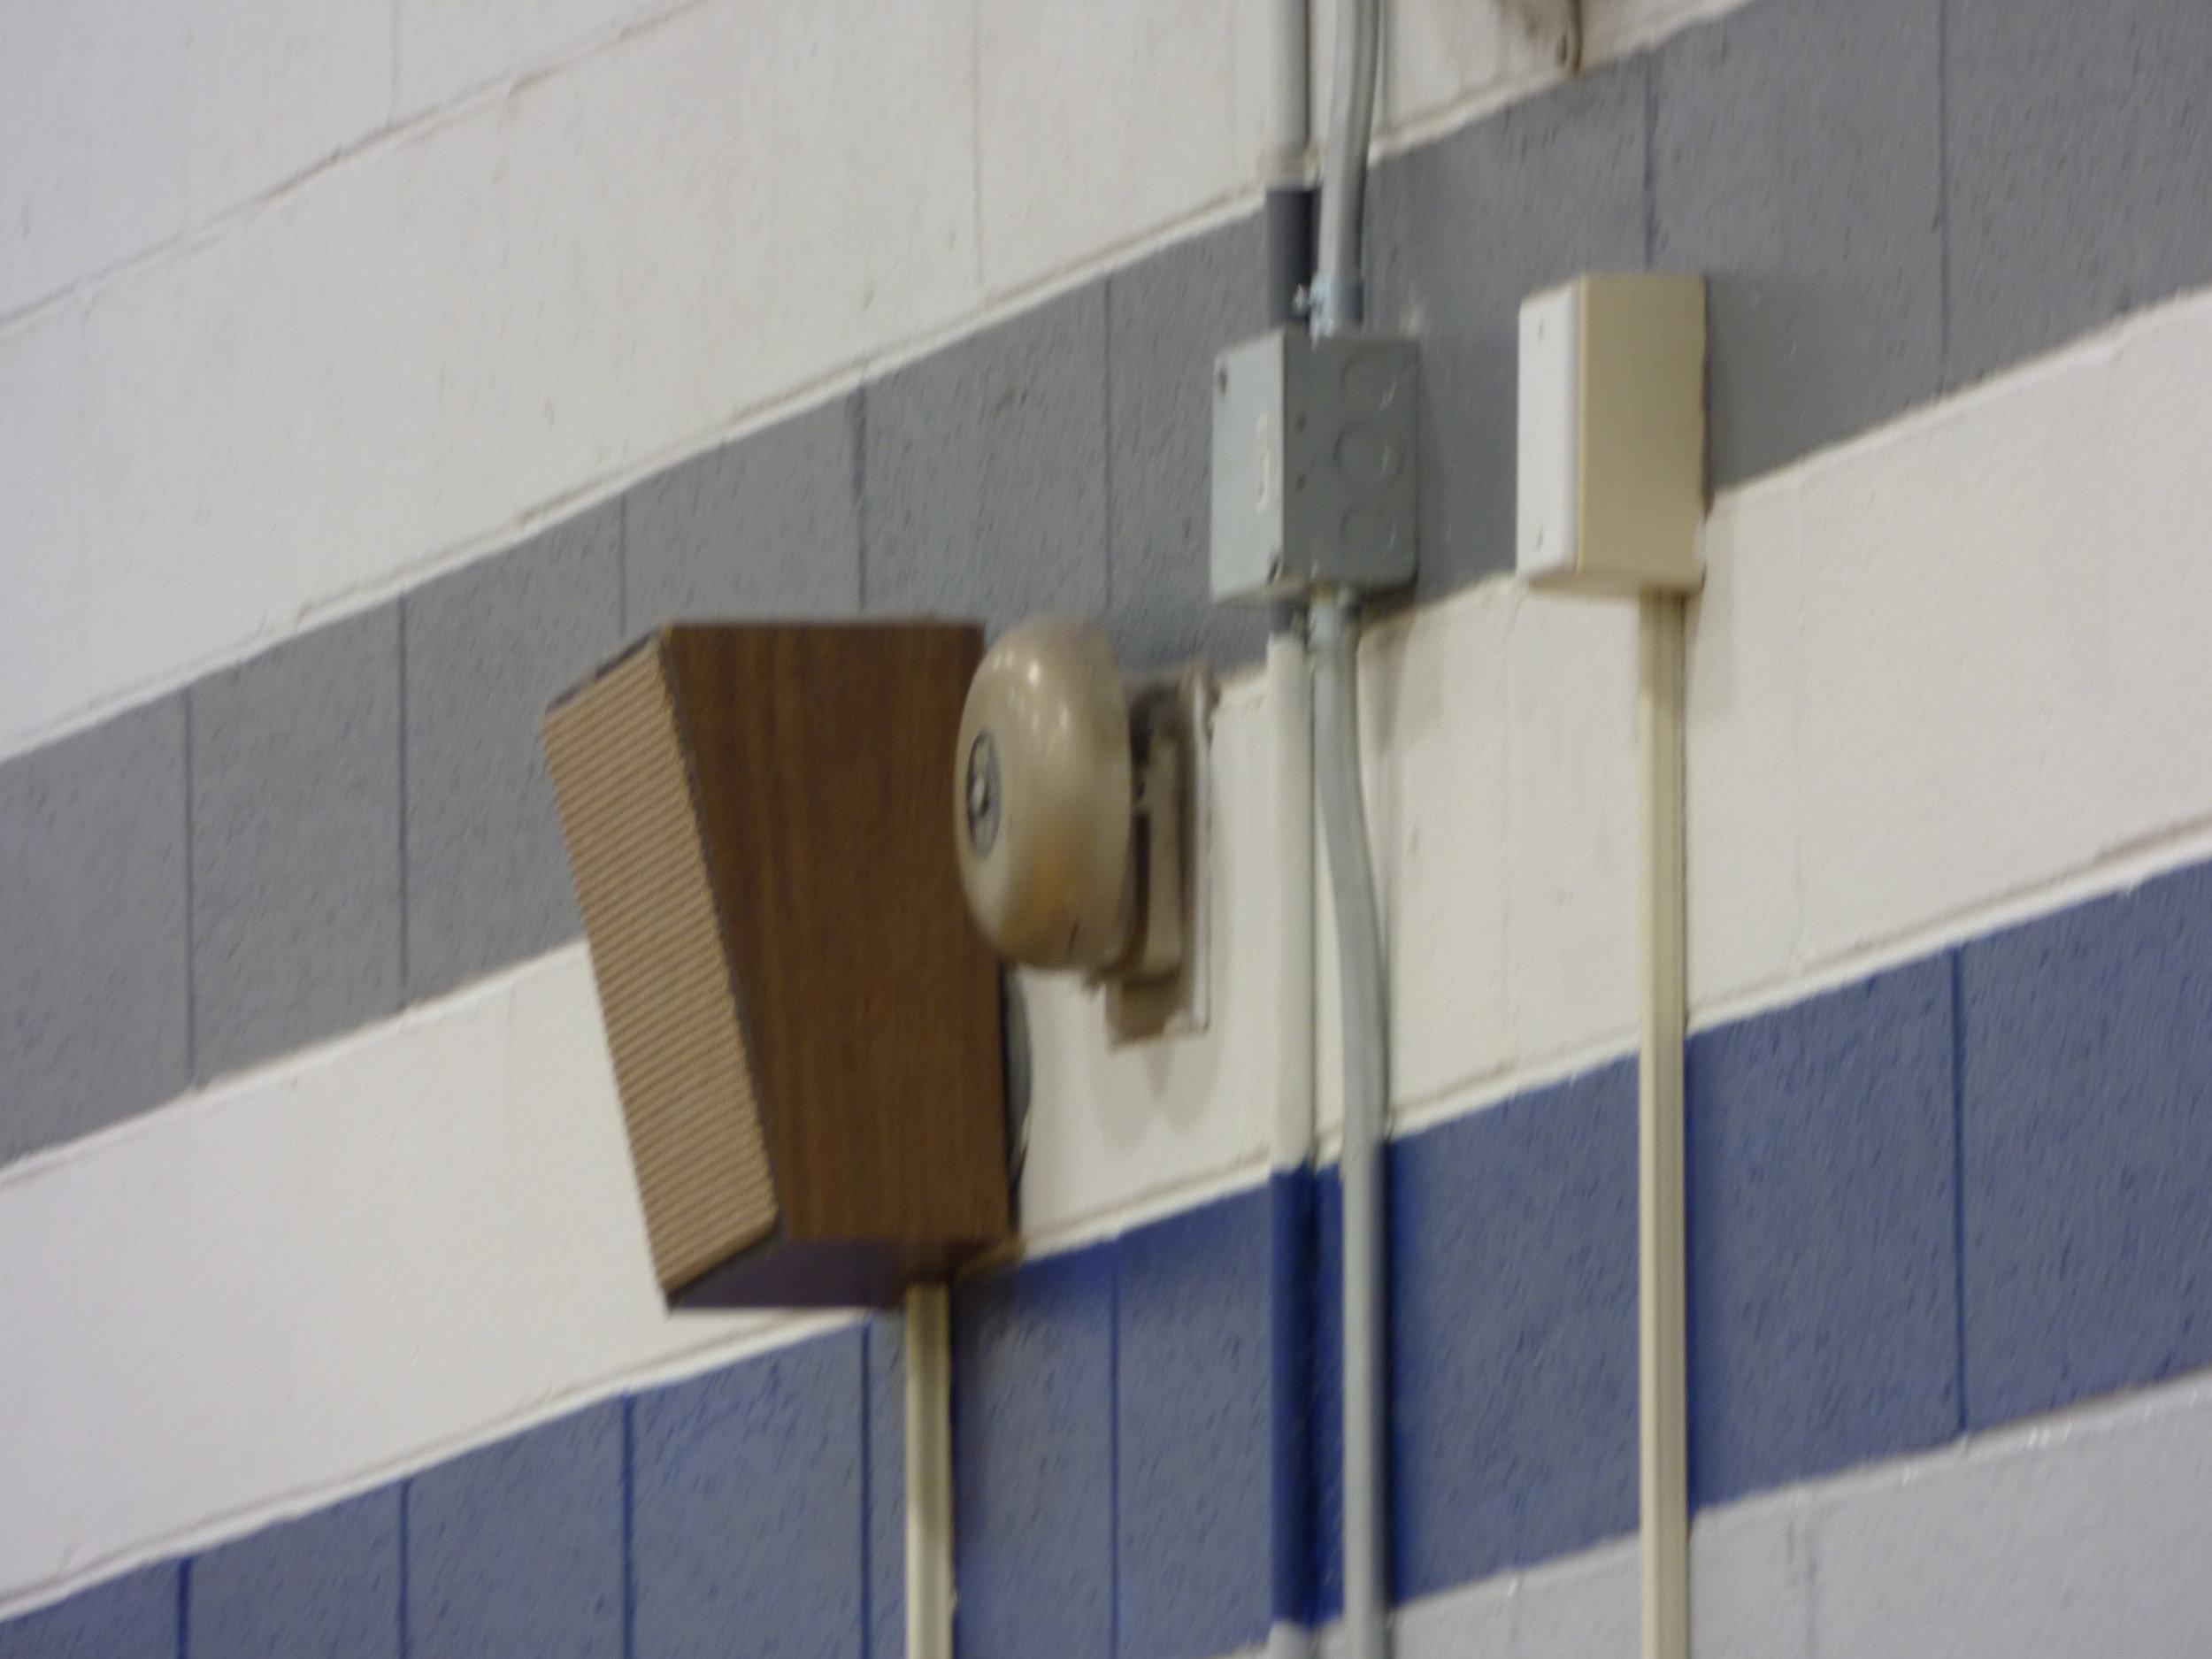 School Speaker and Alarm